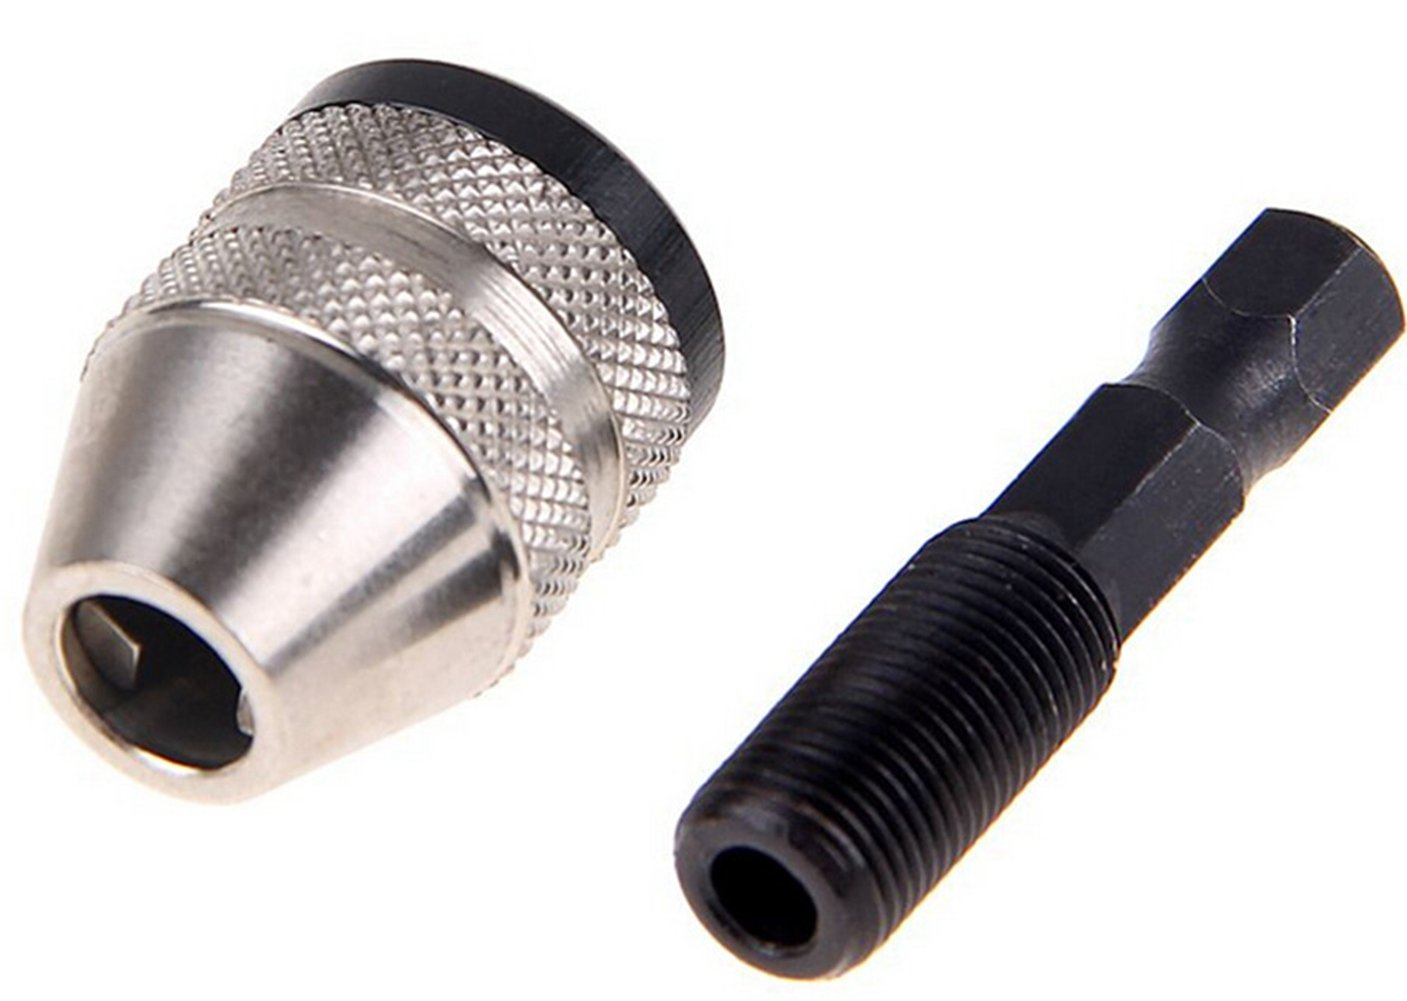 MALAYAS 1//4 Keyless Chuck 0.3-6.5mm 3 Jaw Keyless Drill Chuck Adapter Conversion Tool Hex Shank-Holds Micro